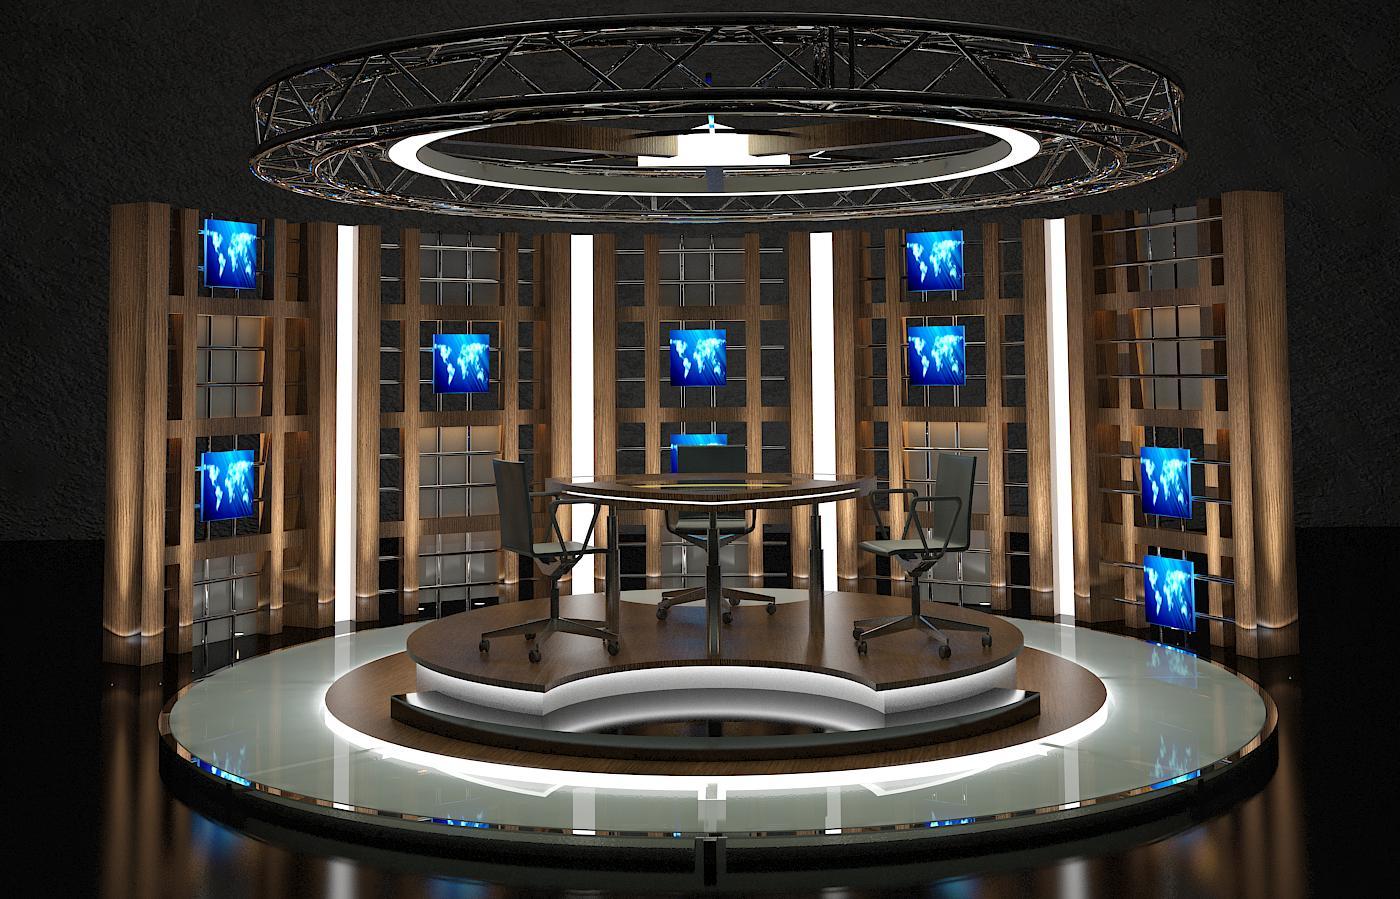 virtual tv studio chat set 17 by canan85